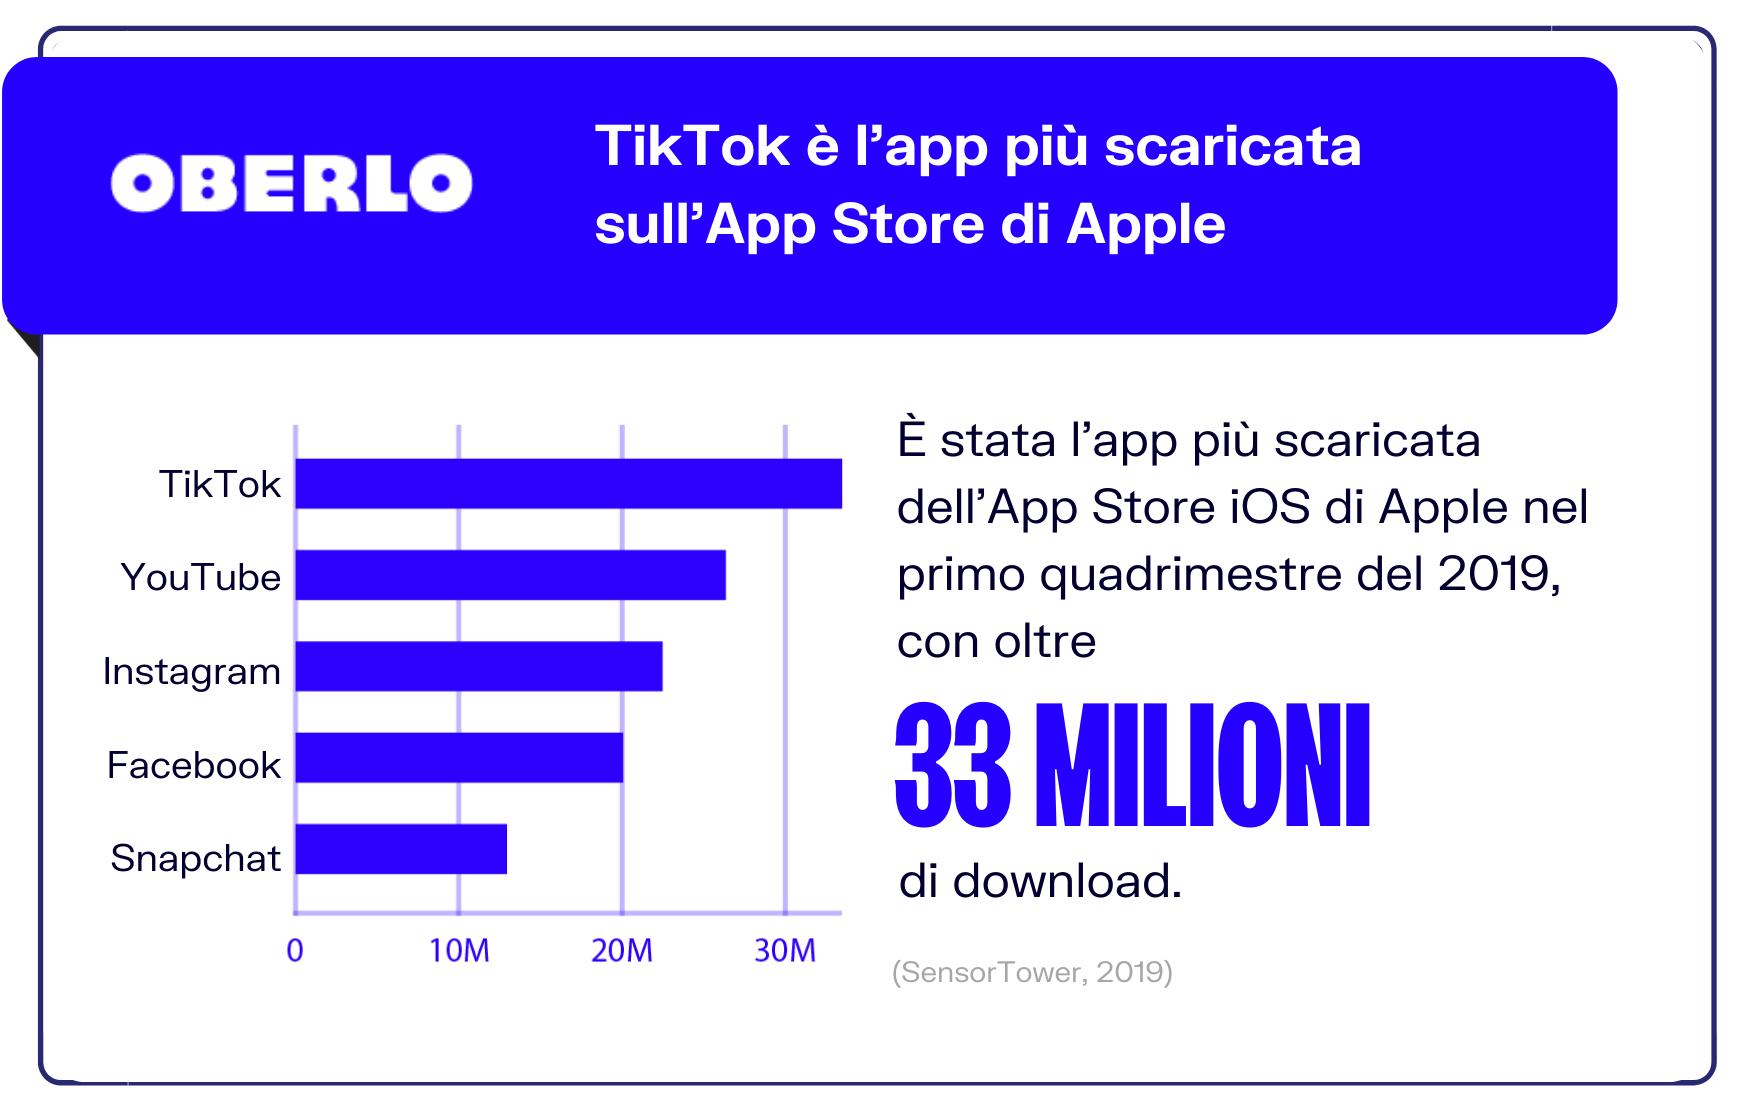 statistiche tiktok app store